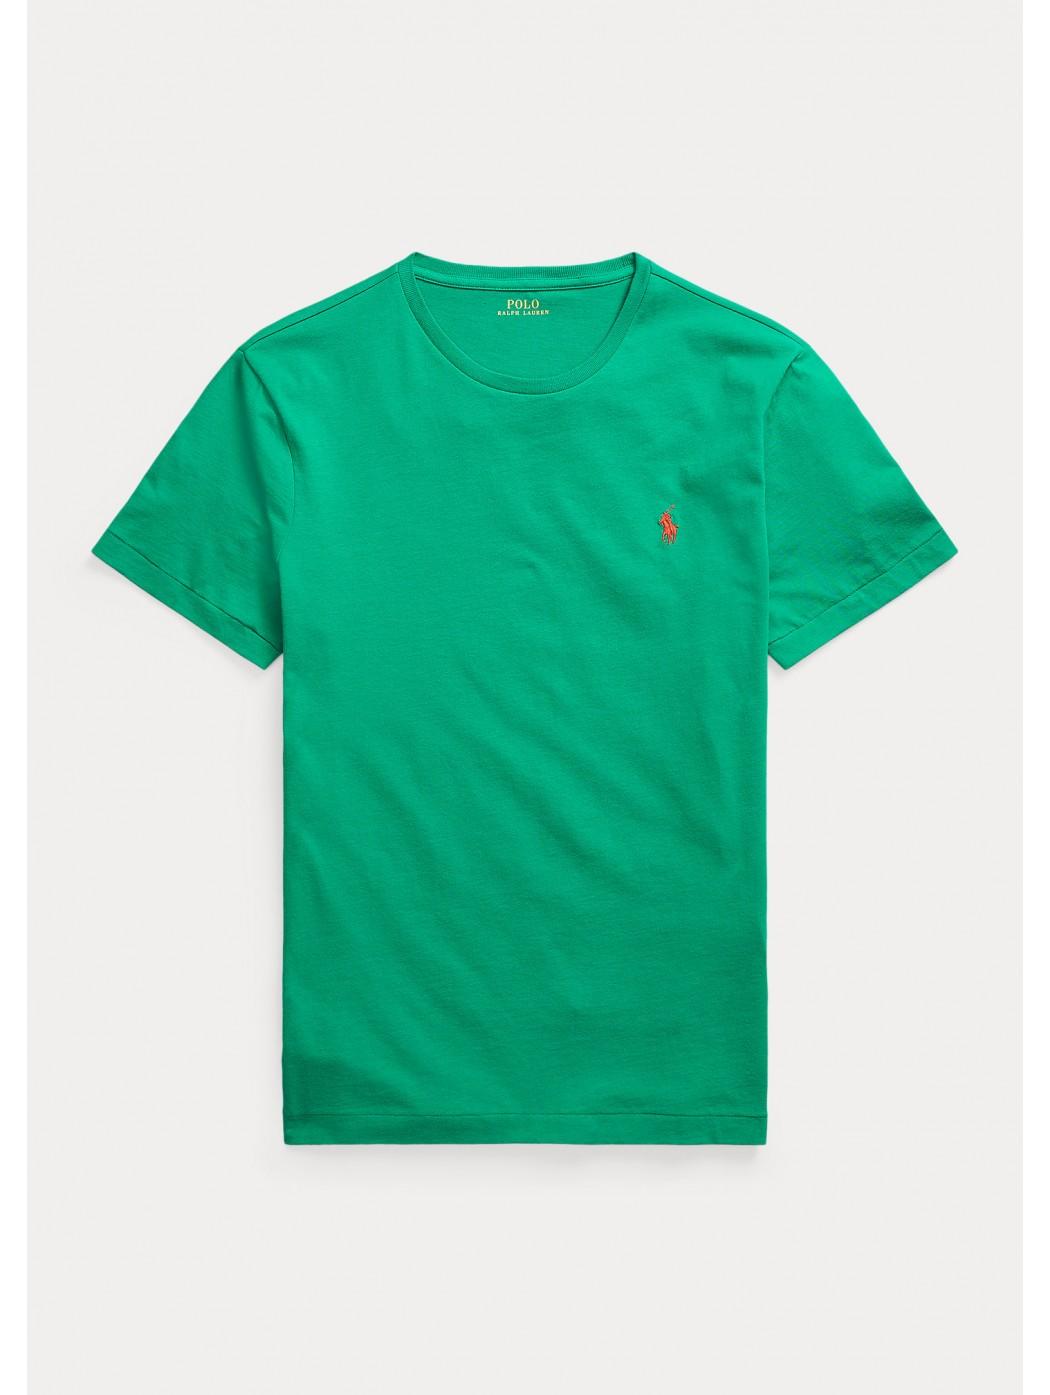 Maglietta in jersey Custom Slim-Fit POLO RALPH LAUREN UOMO 710671438 208